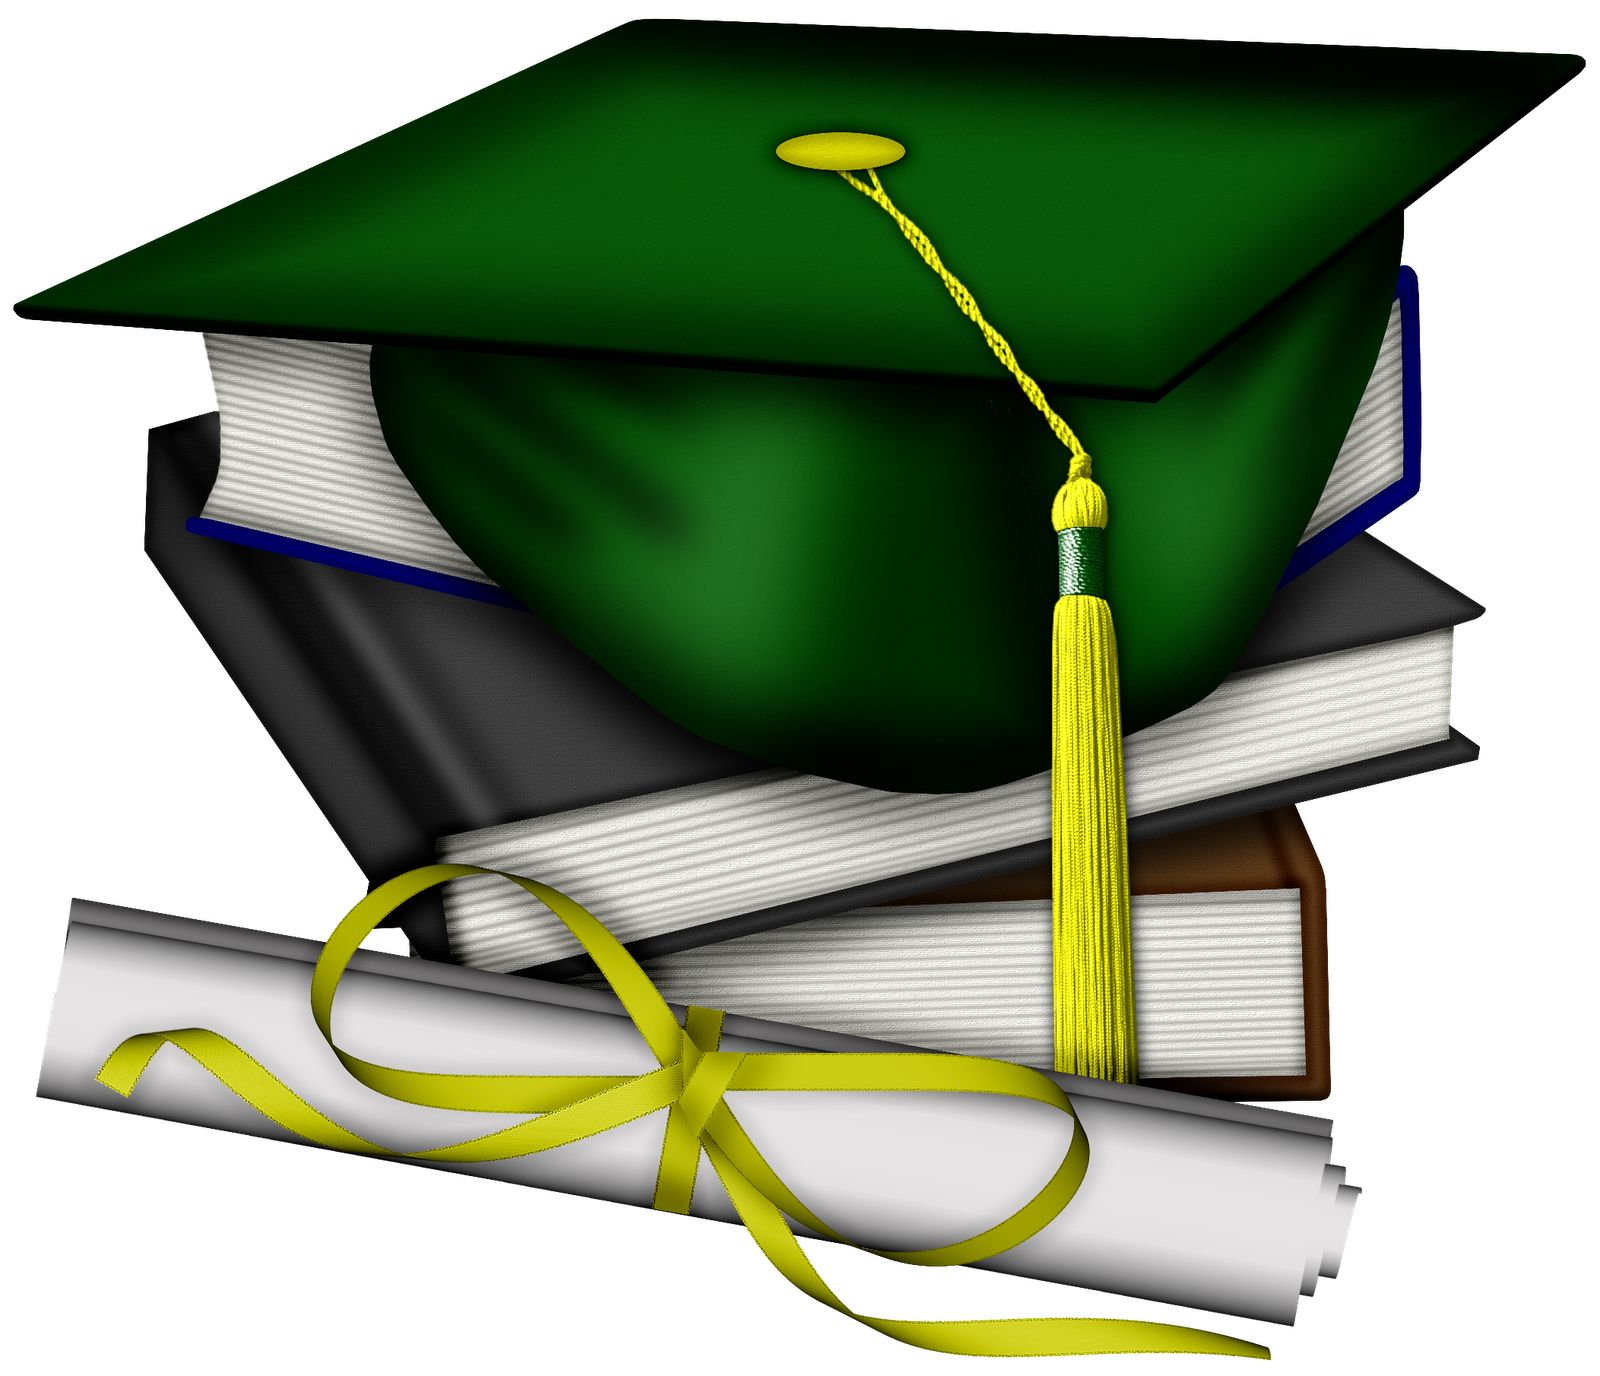 Green Graduation Cap Clipart - ClipArt Best